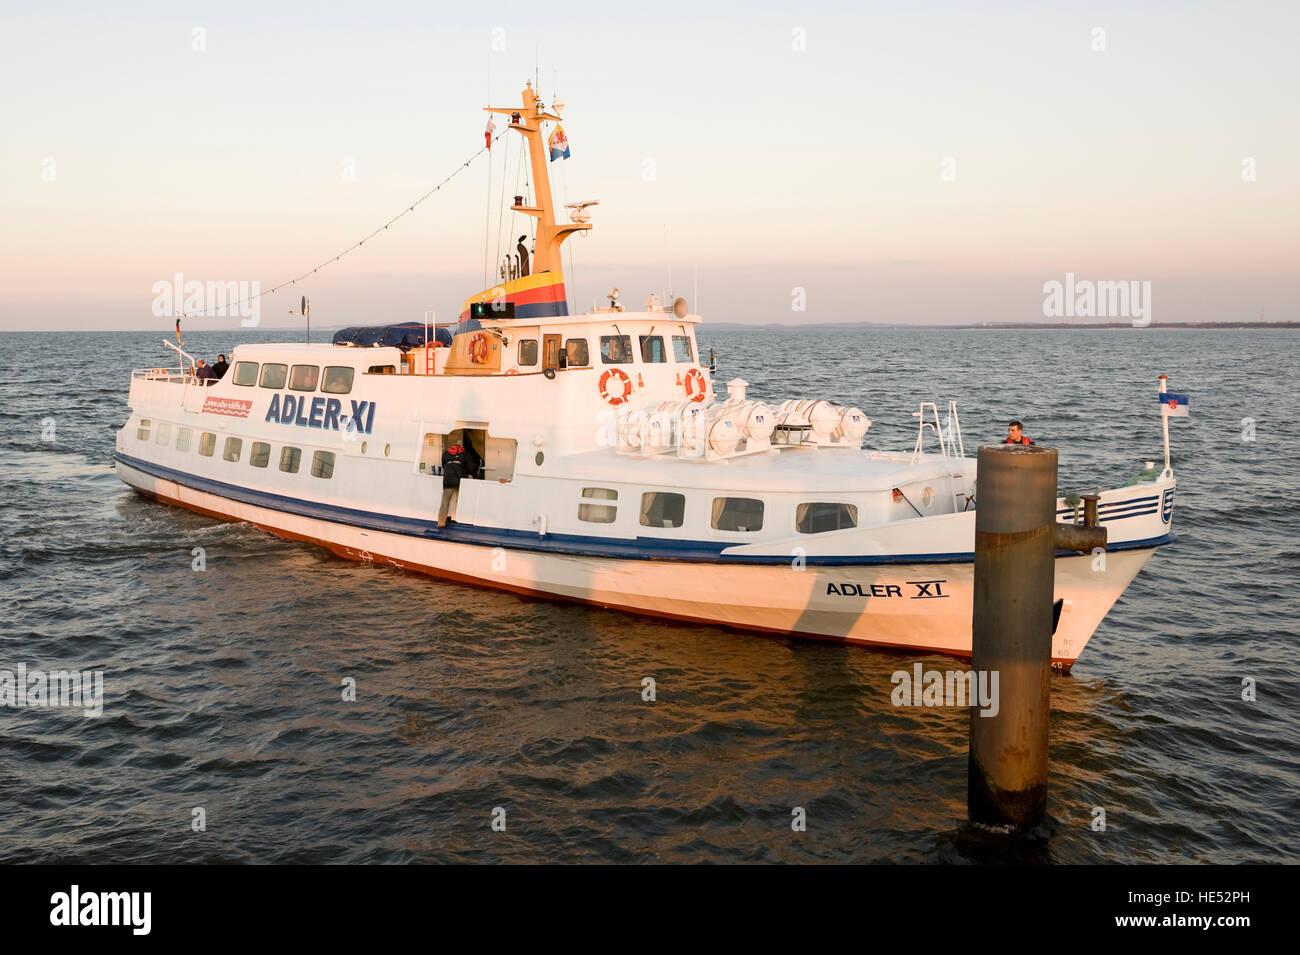 Passenger liner ADLER-XI, Ahlbeck seaside resort, Usedom Island, Mecklenburg-Western Pomerania - Stock Image